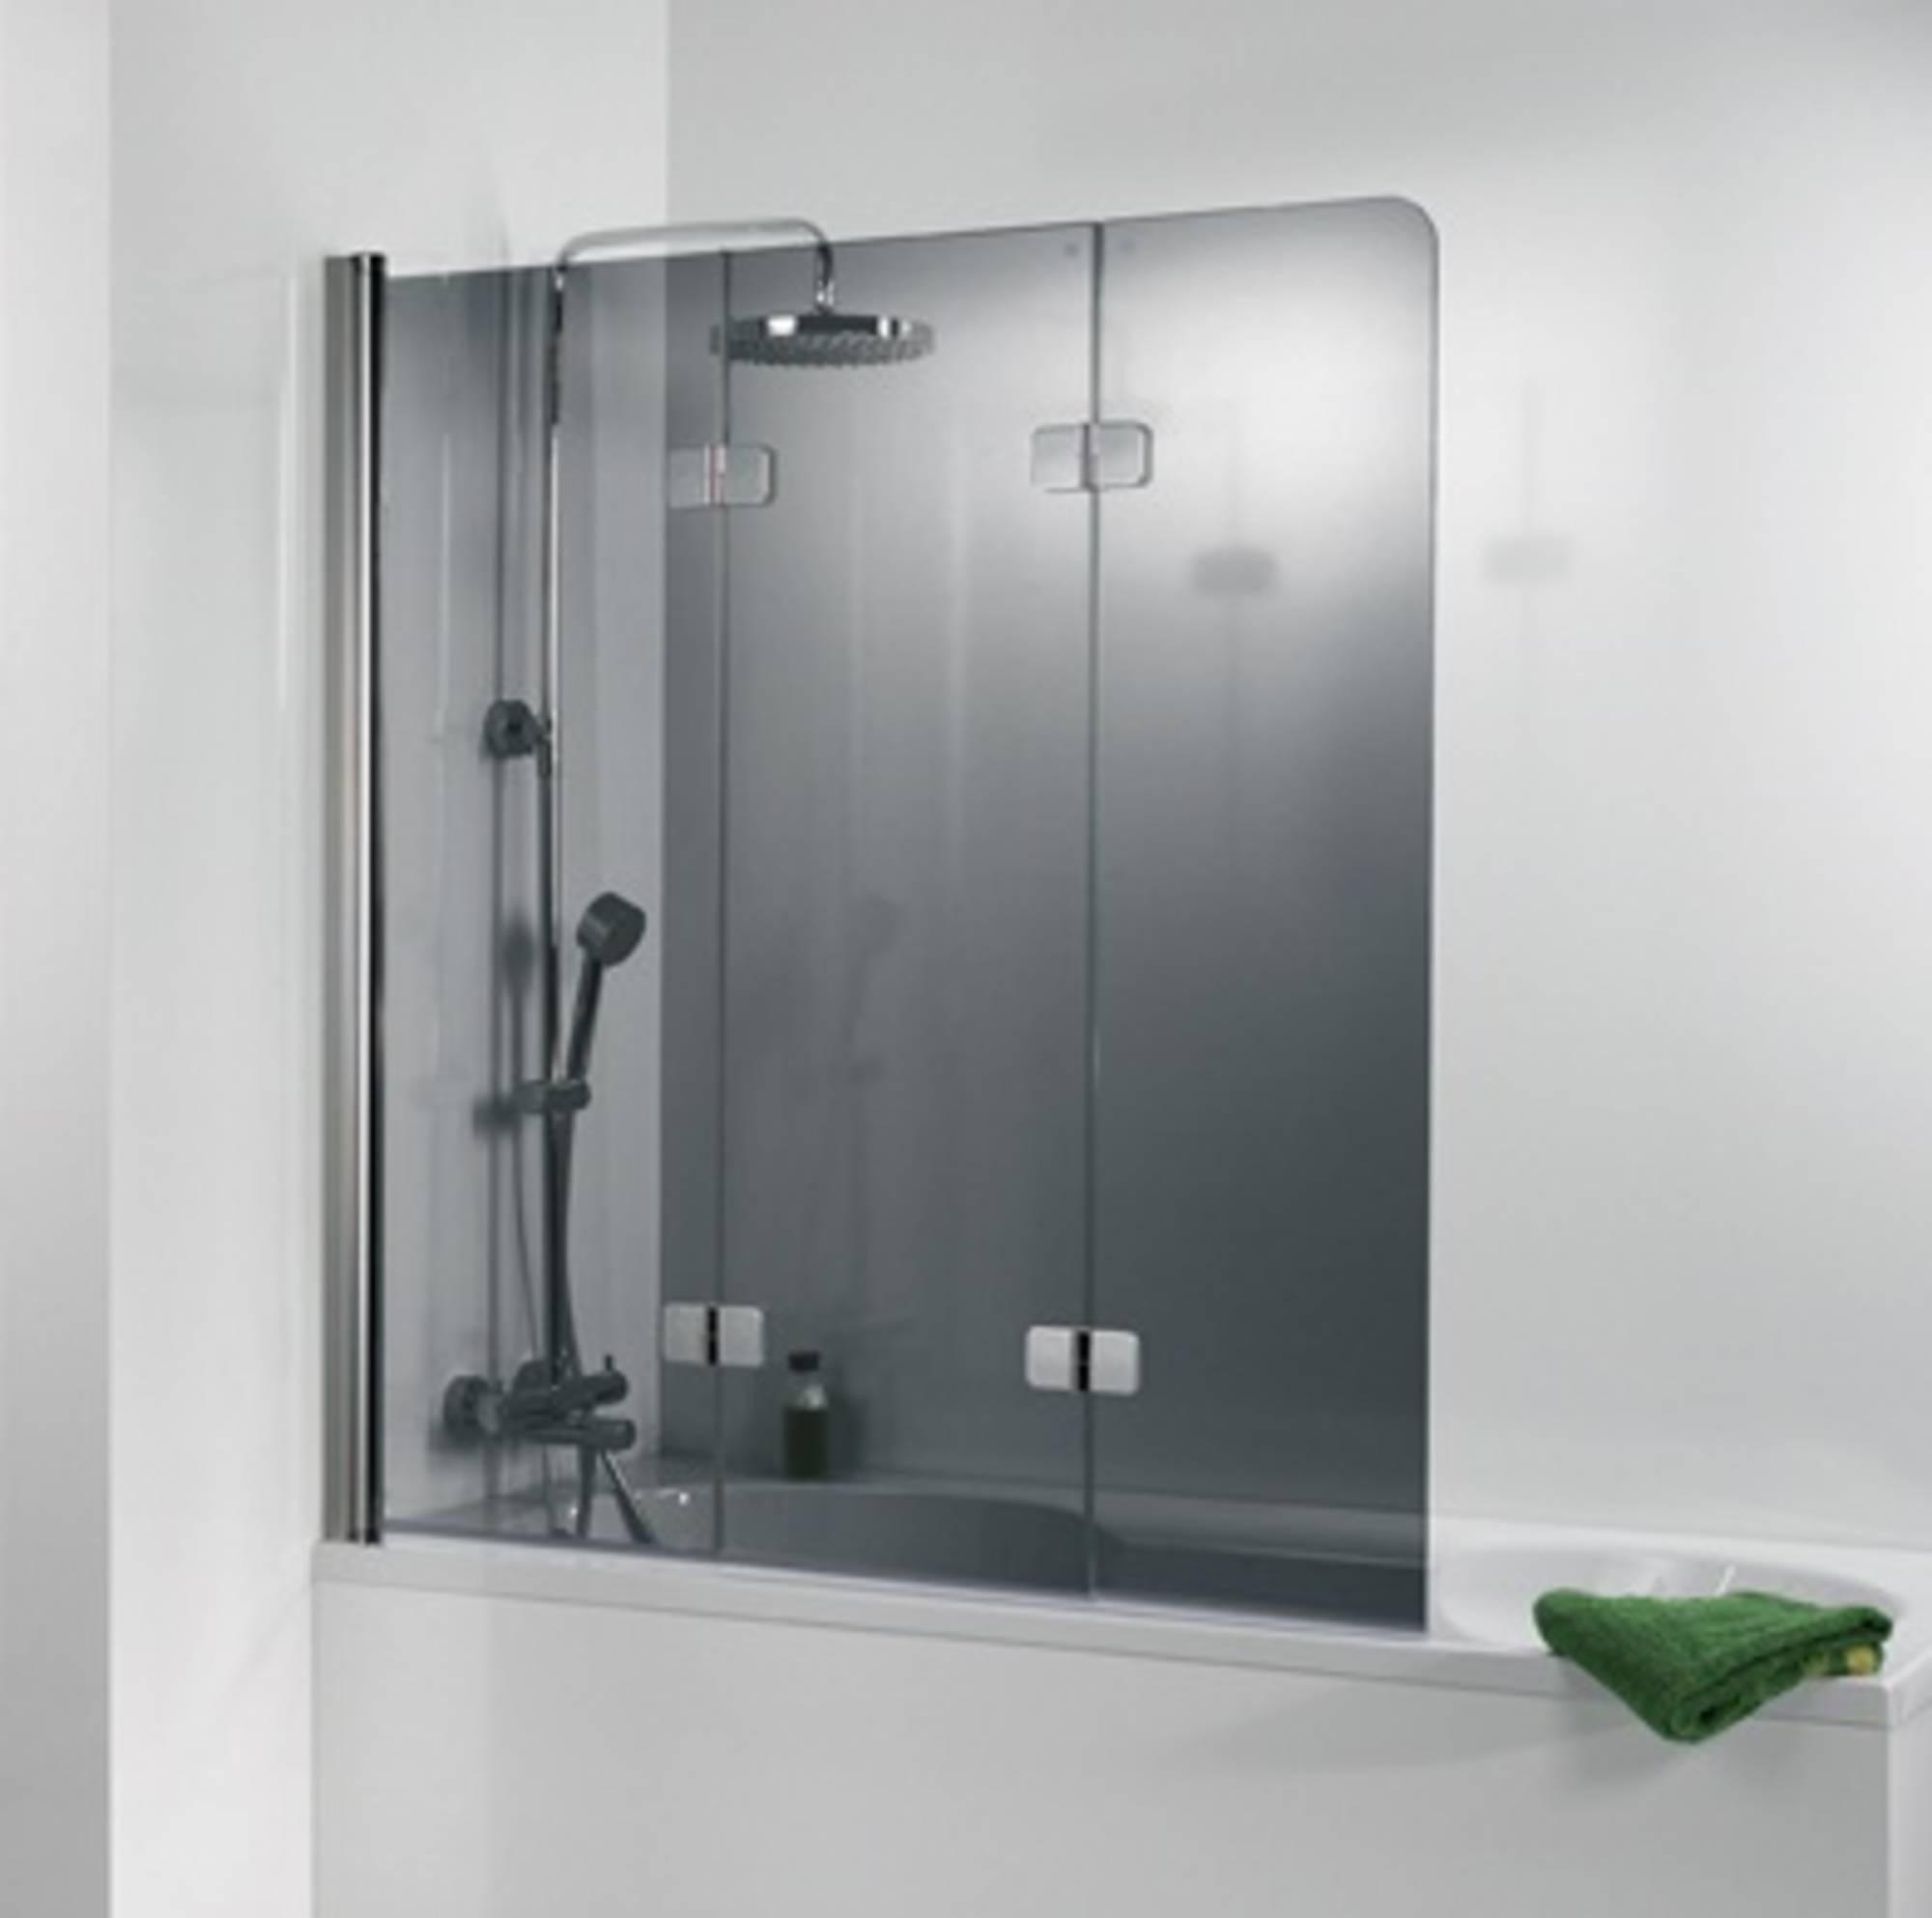 Ben Martino Soft 3-delige Badklapwand 114x140cm Chroom - Grijs Glas